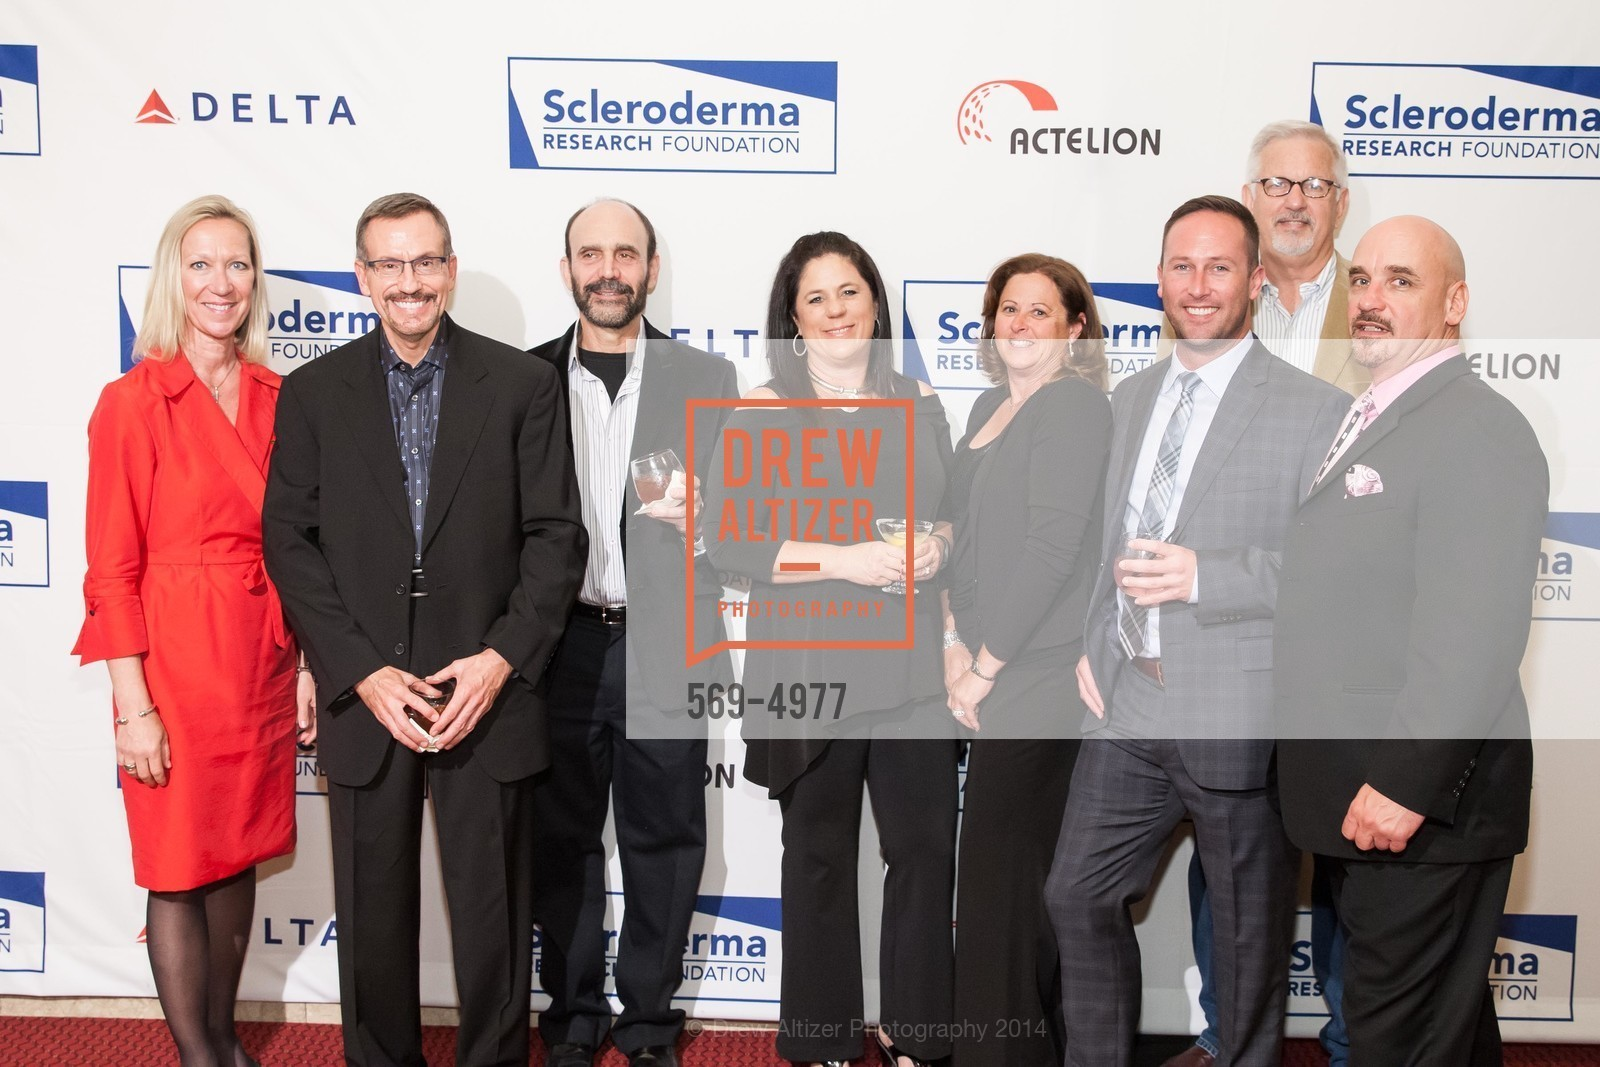 Pam Stolk, Dave Kapple, Will Green, Charlene O'Leary, Mark Zigler, Brian Pierce, Jeff Brand, Photo #569-4977